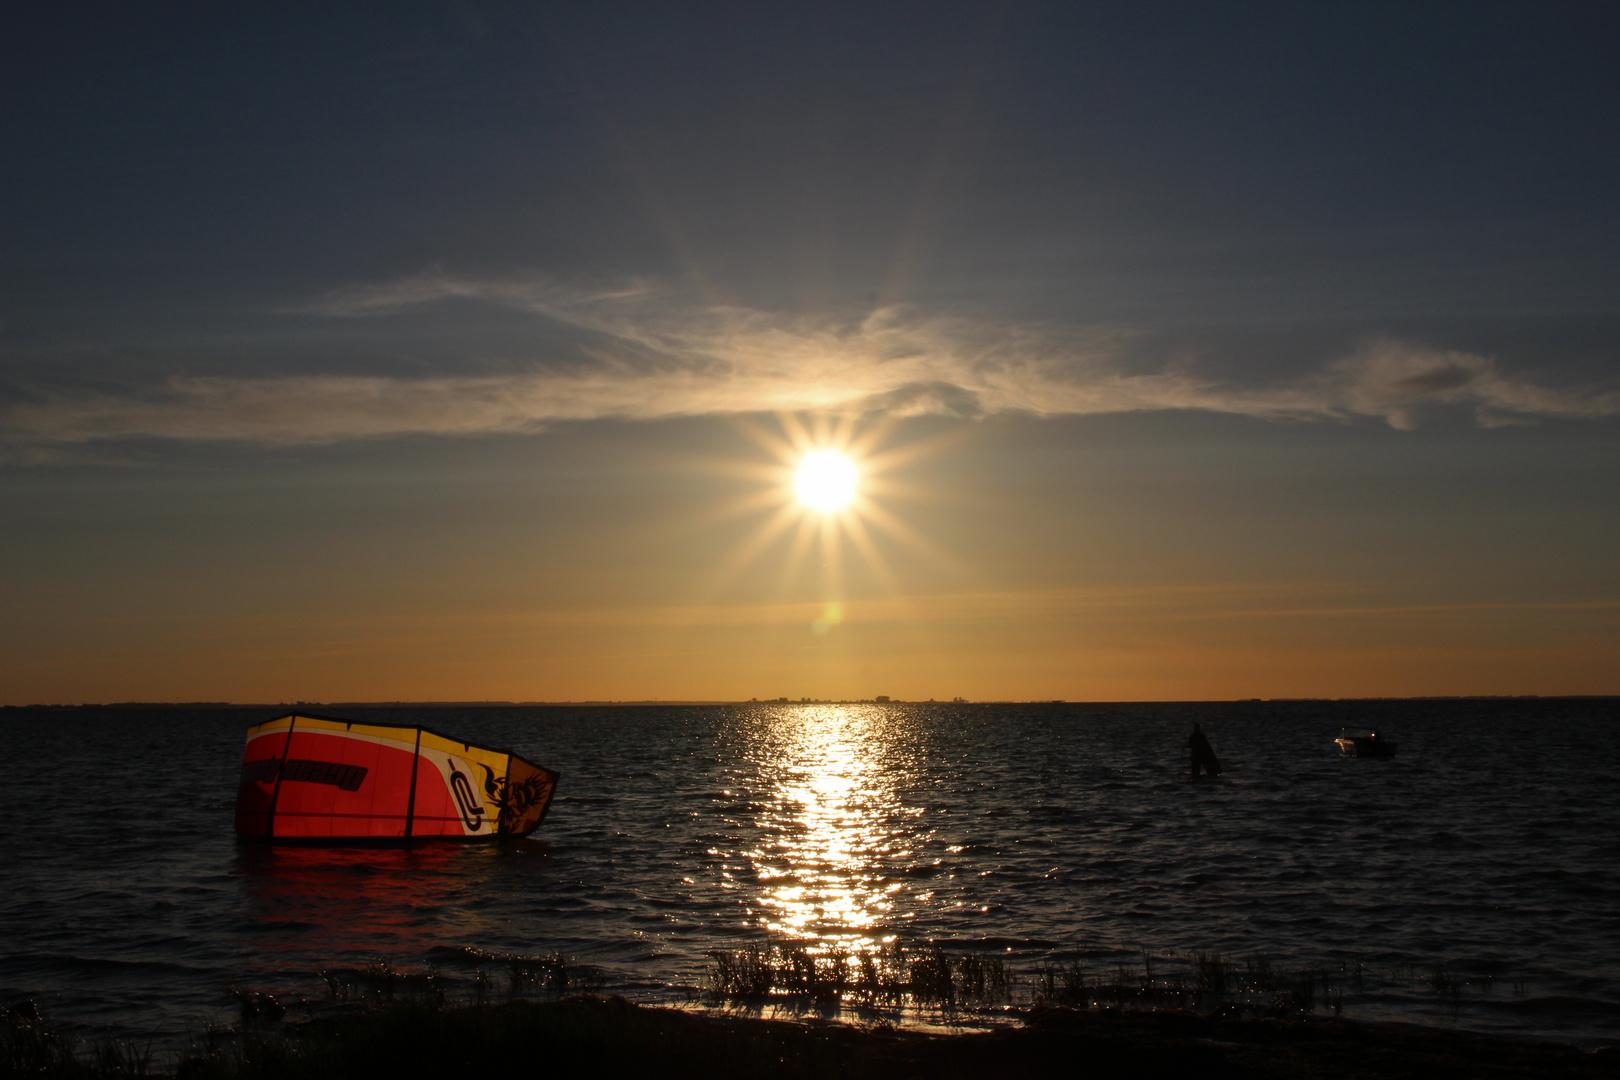 Kitesurfer im Sonnenuntergang